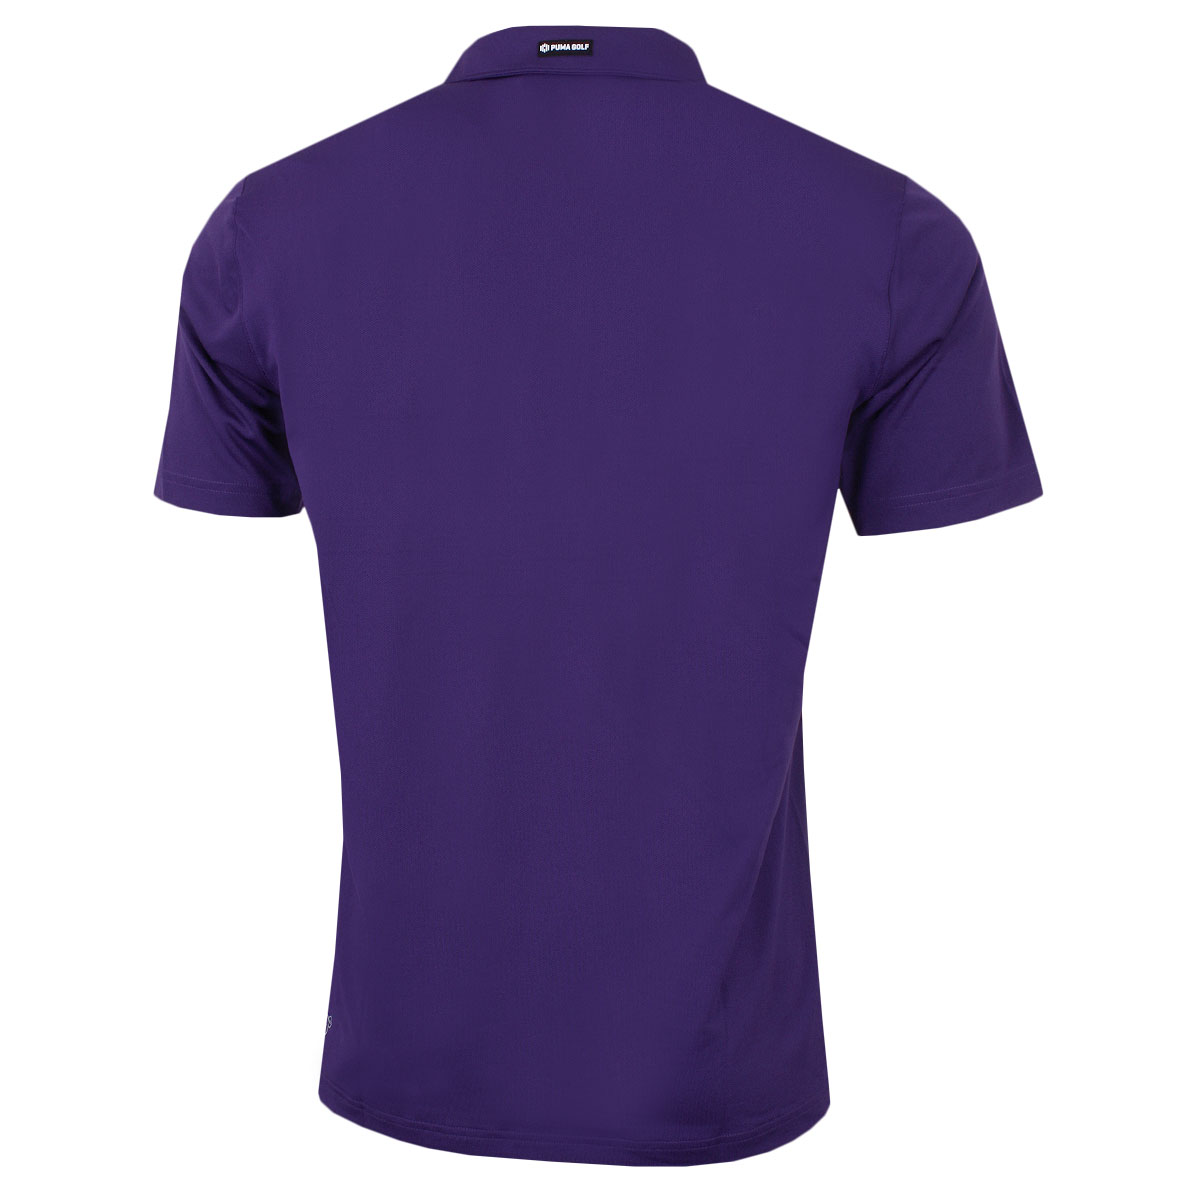 Puma-Golf-Mens-Essential-Pounce-Cresting-DryCell-Tech-Polo-Shirt-46-OFF-RRP thumbnail 34